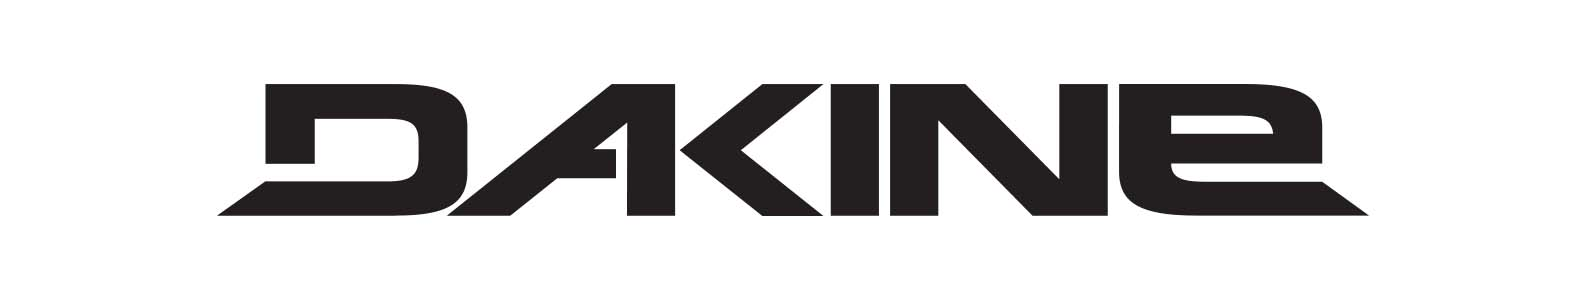 Dakine brand header image